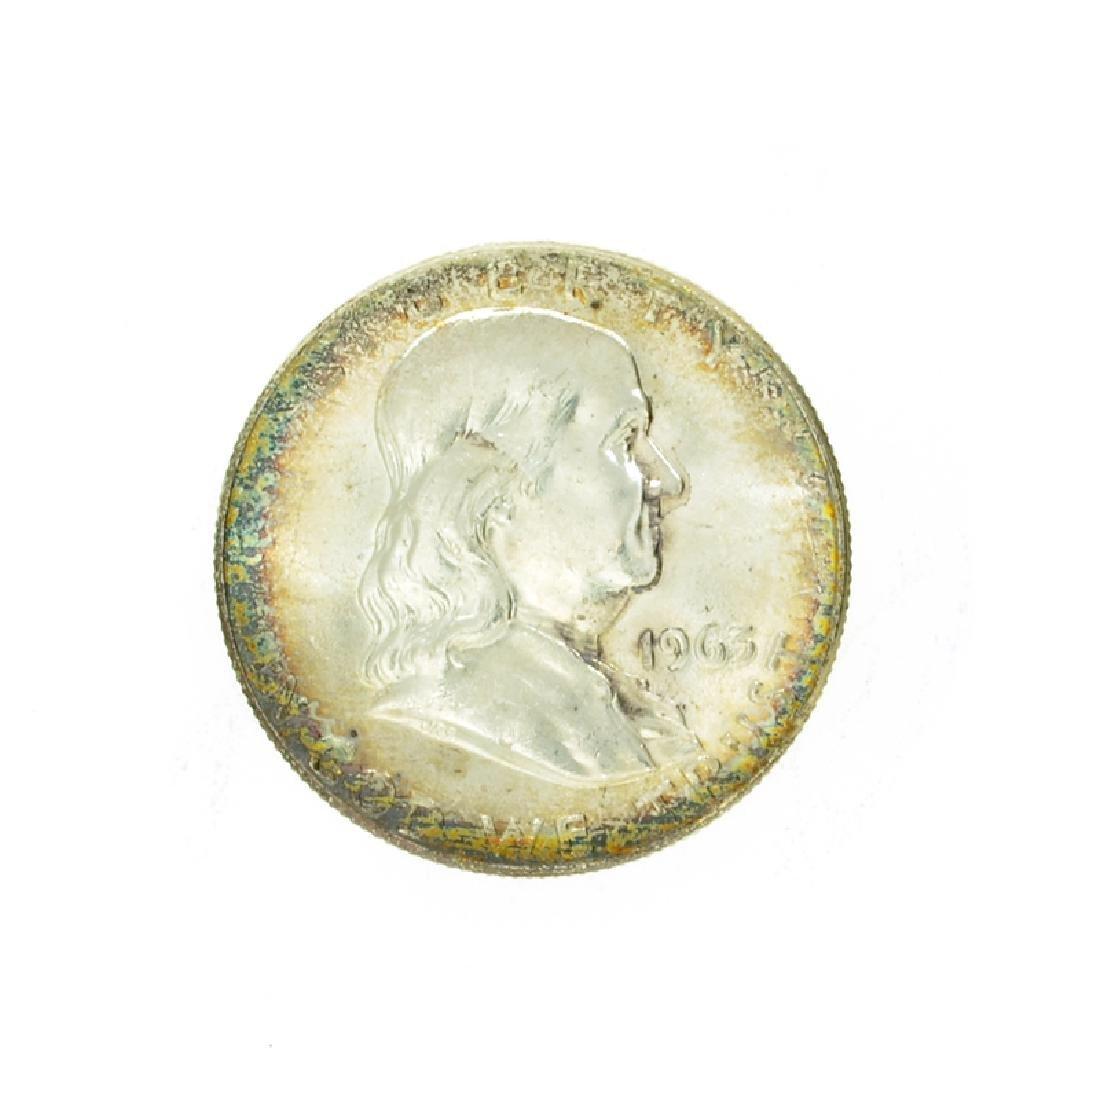 1963 Franklin Liberty Bell Half Dollar Coin